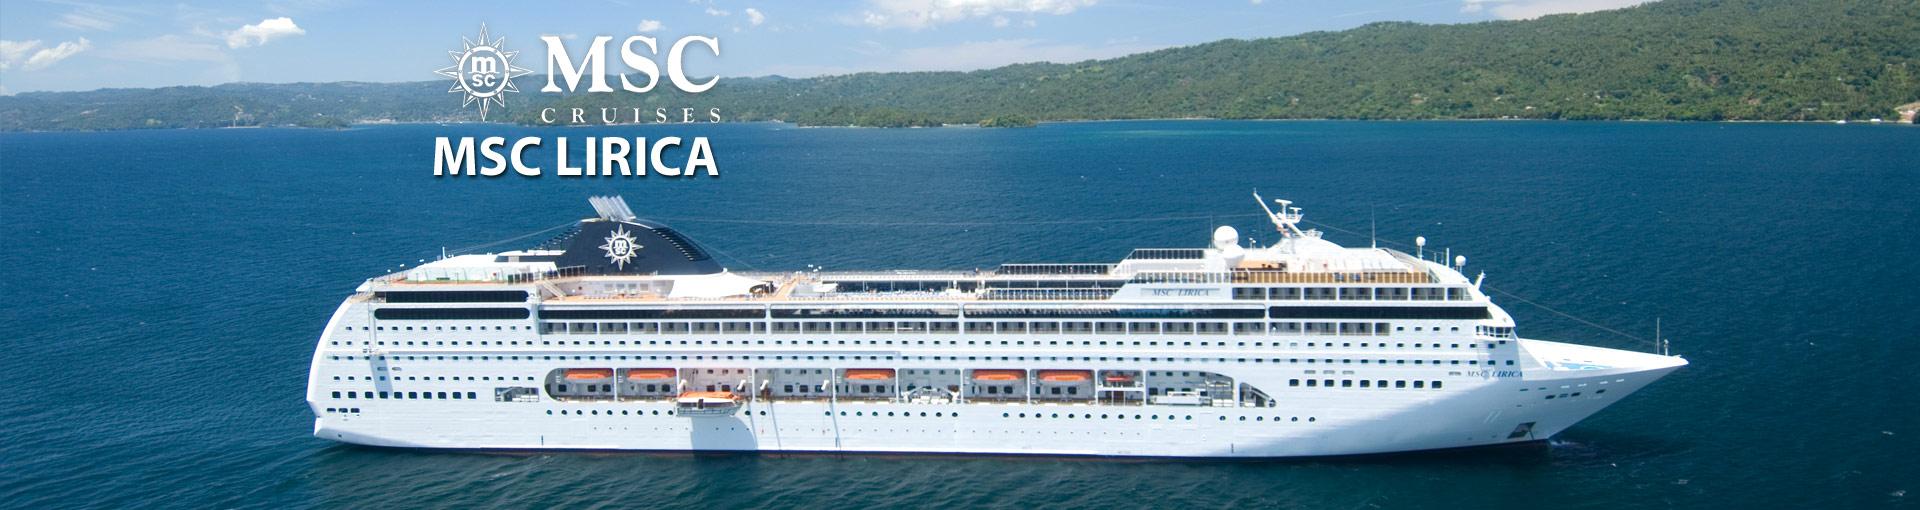 Msc Lirica Cruise Ship 2018 And 2019 Msc Lirica